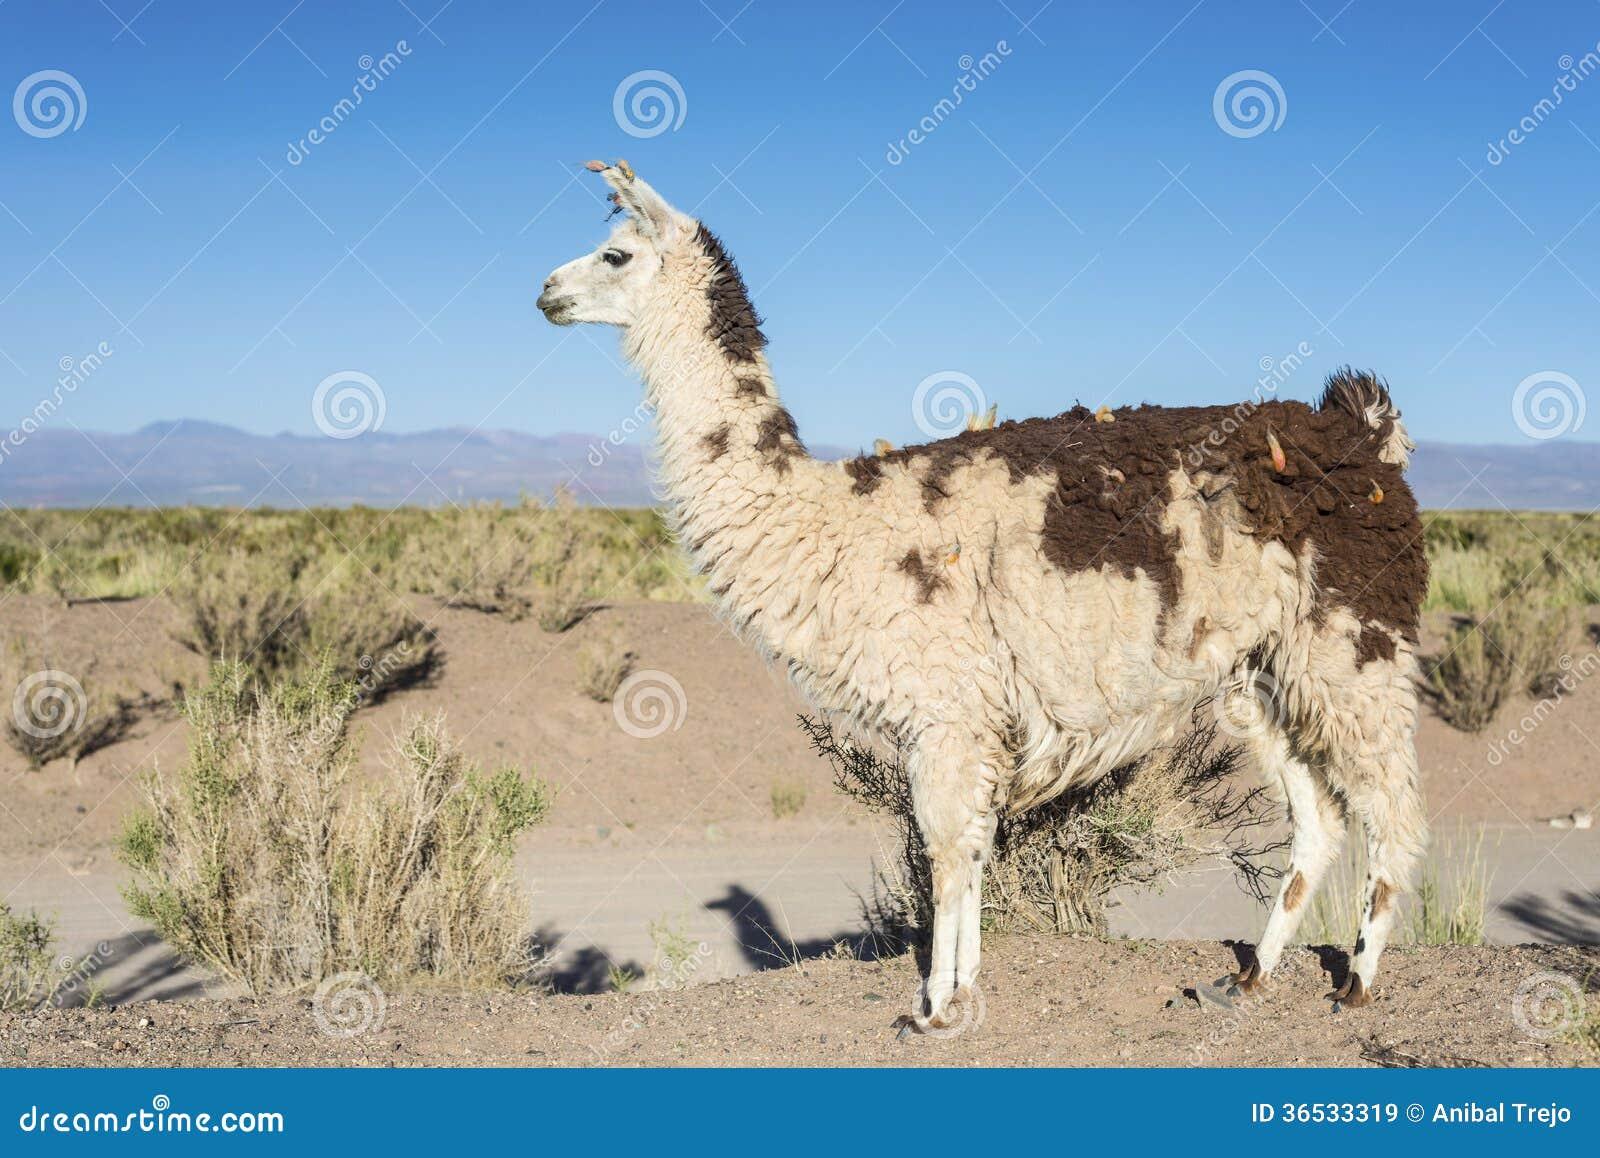 Lama in saline Grandes in Jujuy, Argentina.